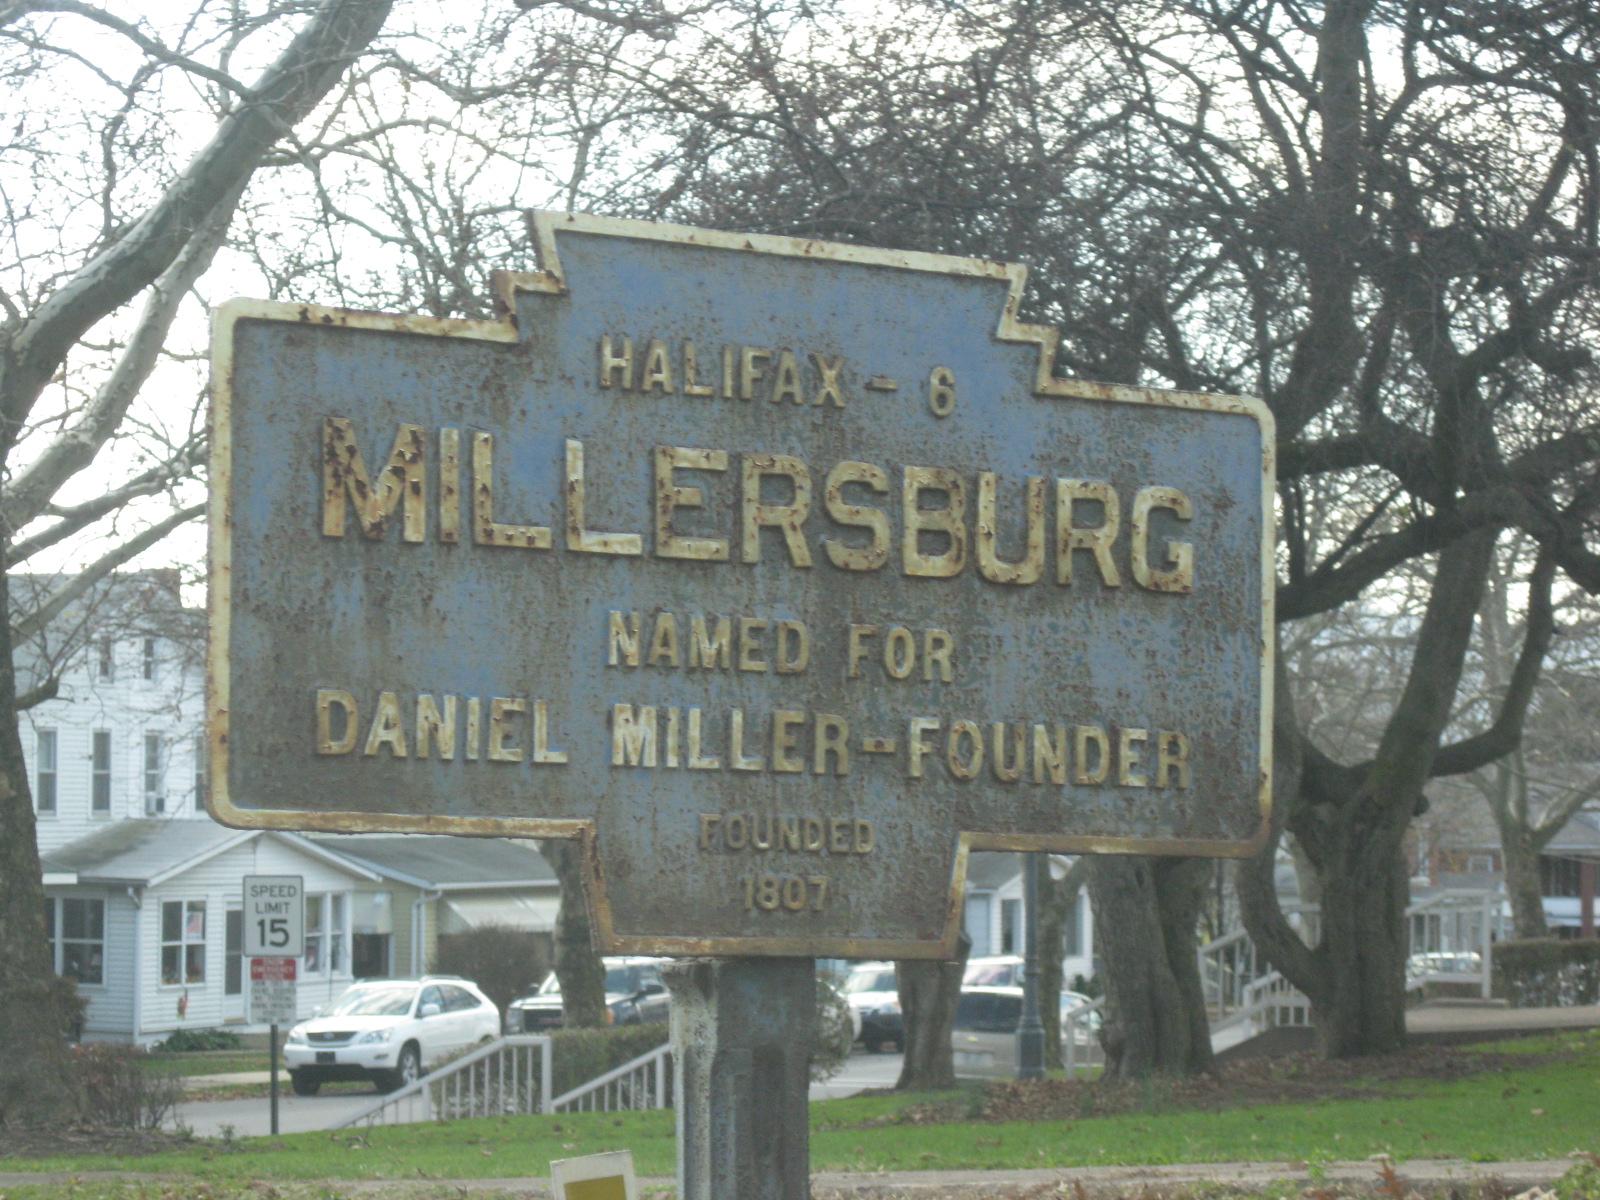 Dating in millersburg pa